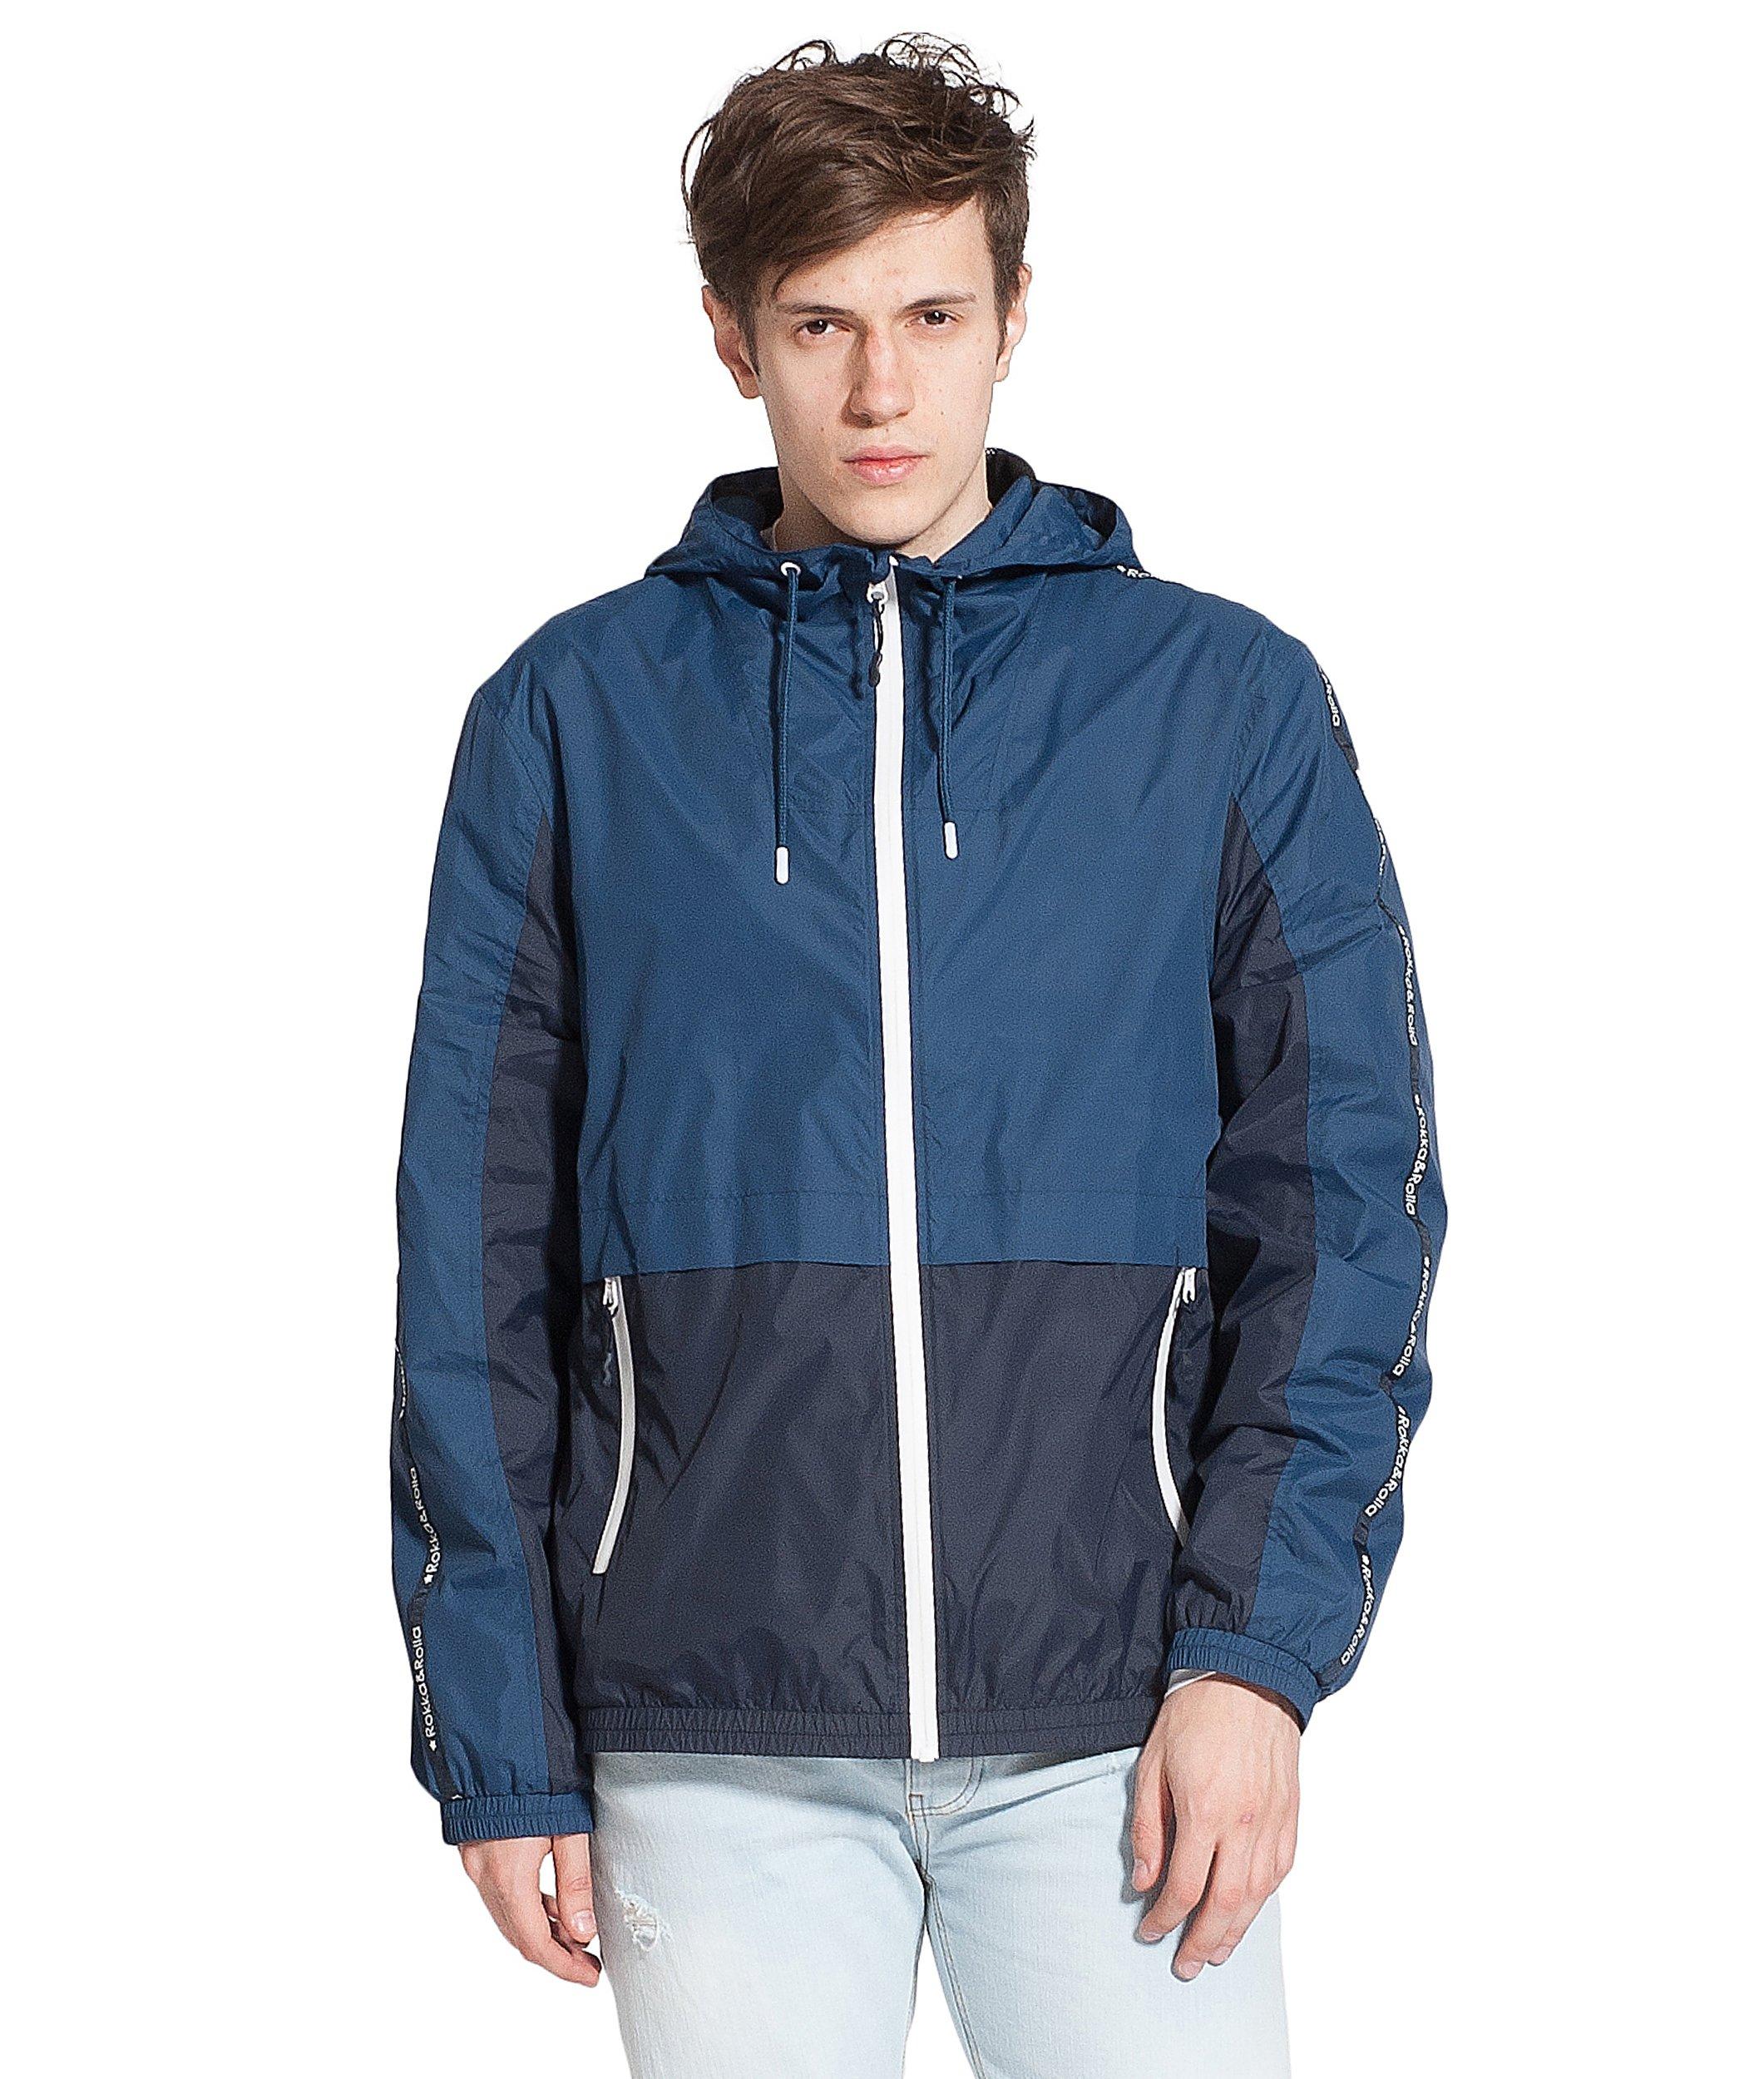 Rokka&Rolla Men's Lightweight Athletic Outdoor Rainproof Hooded Windbreaker Jacket